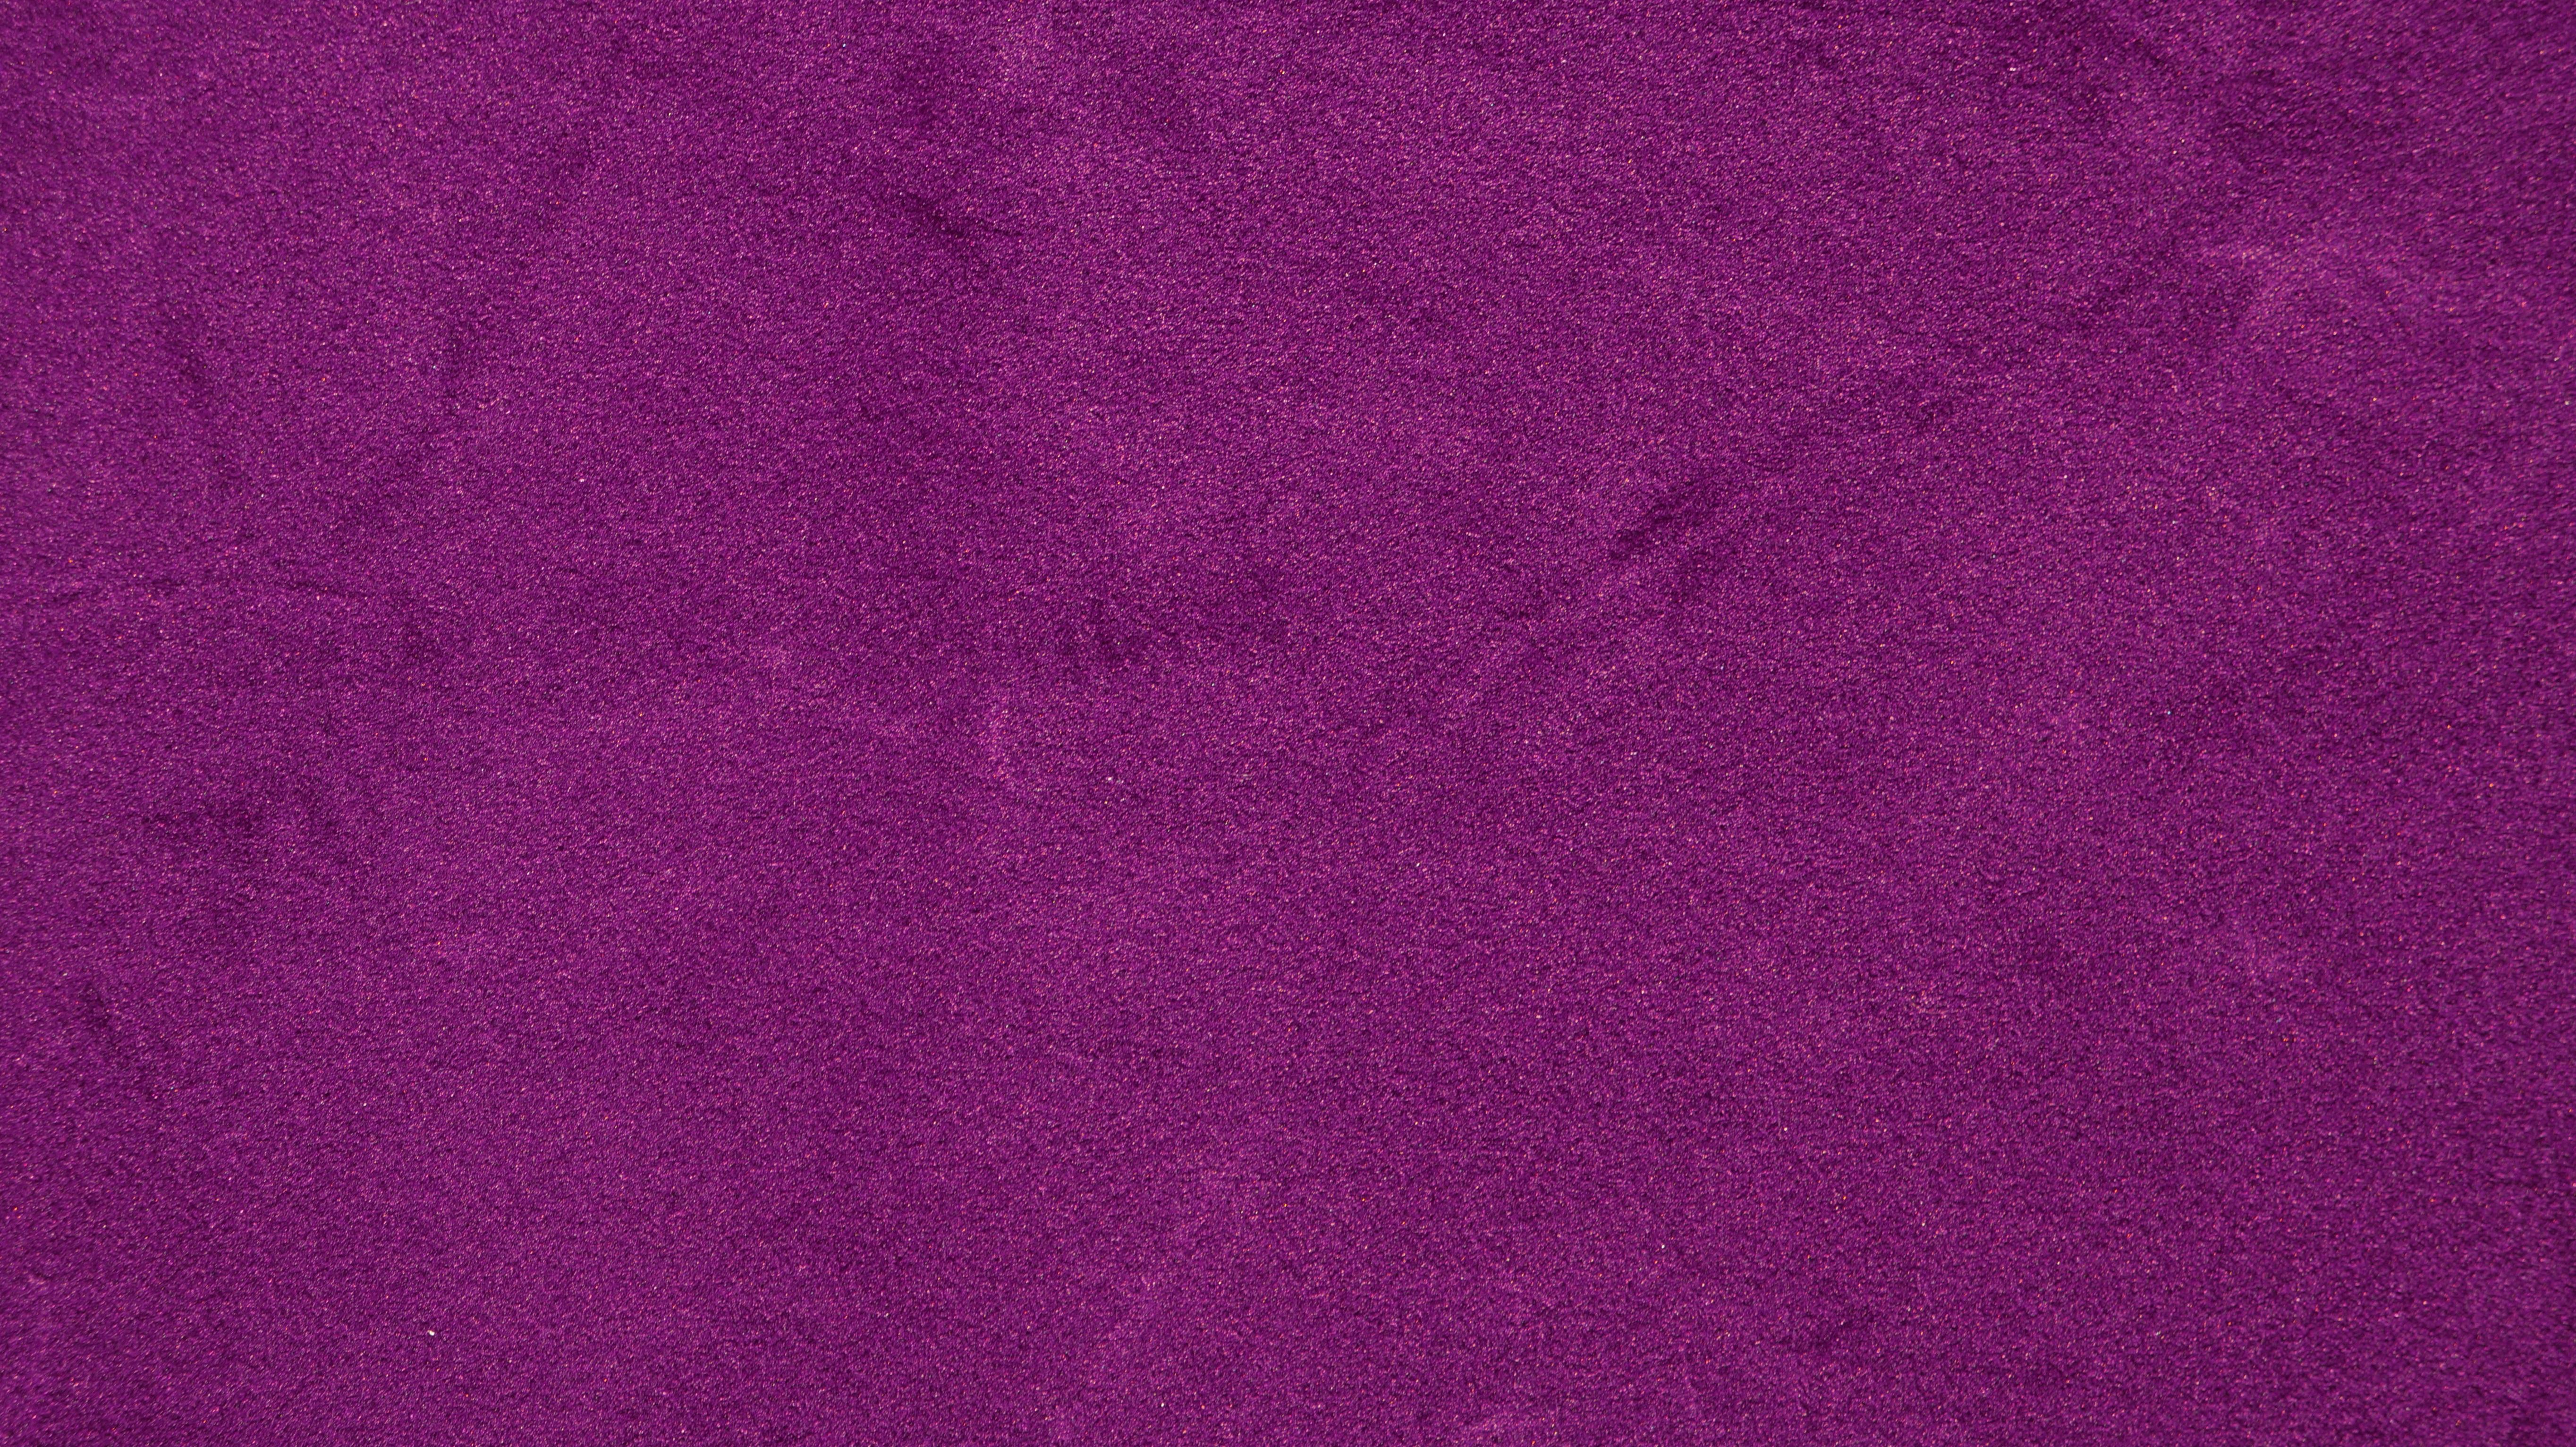 Beautiful Flooring Fotos Gratis Textura P 250 Rpura P 233 Talo Piso Patr 243 N